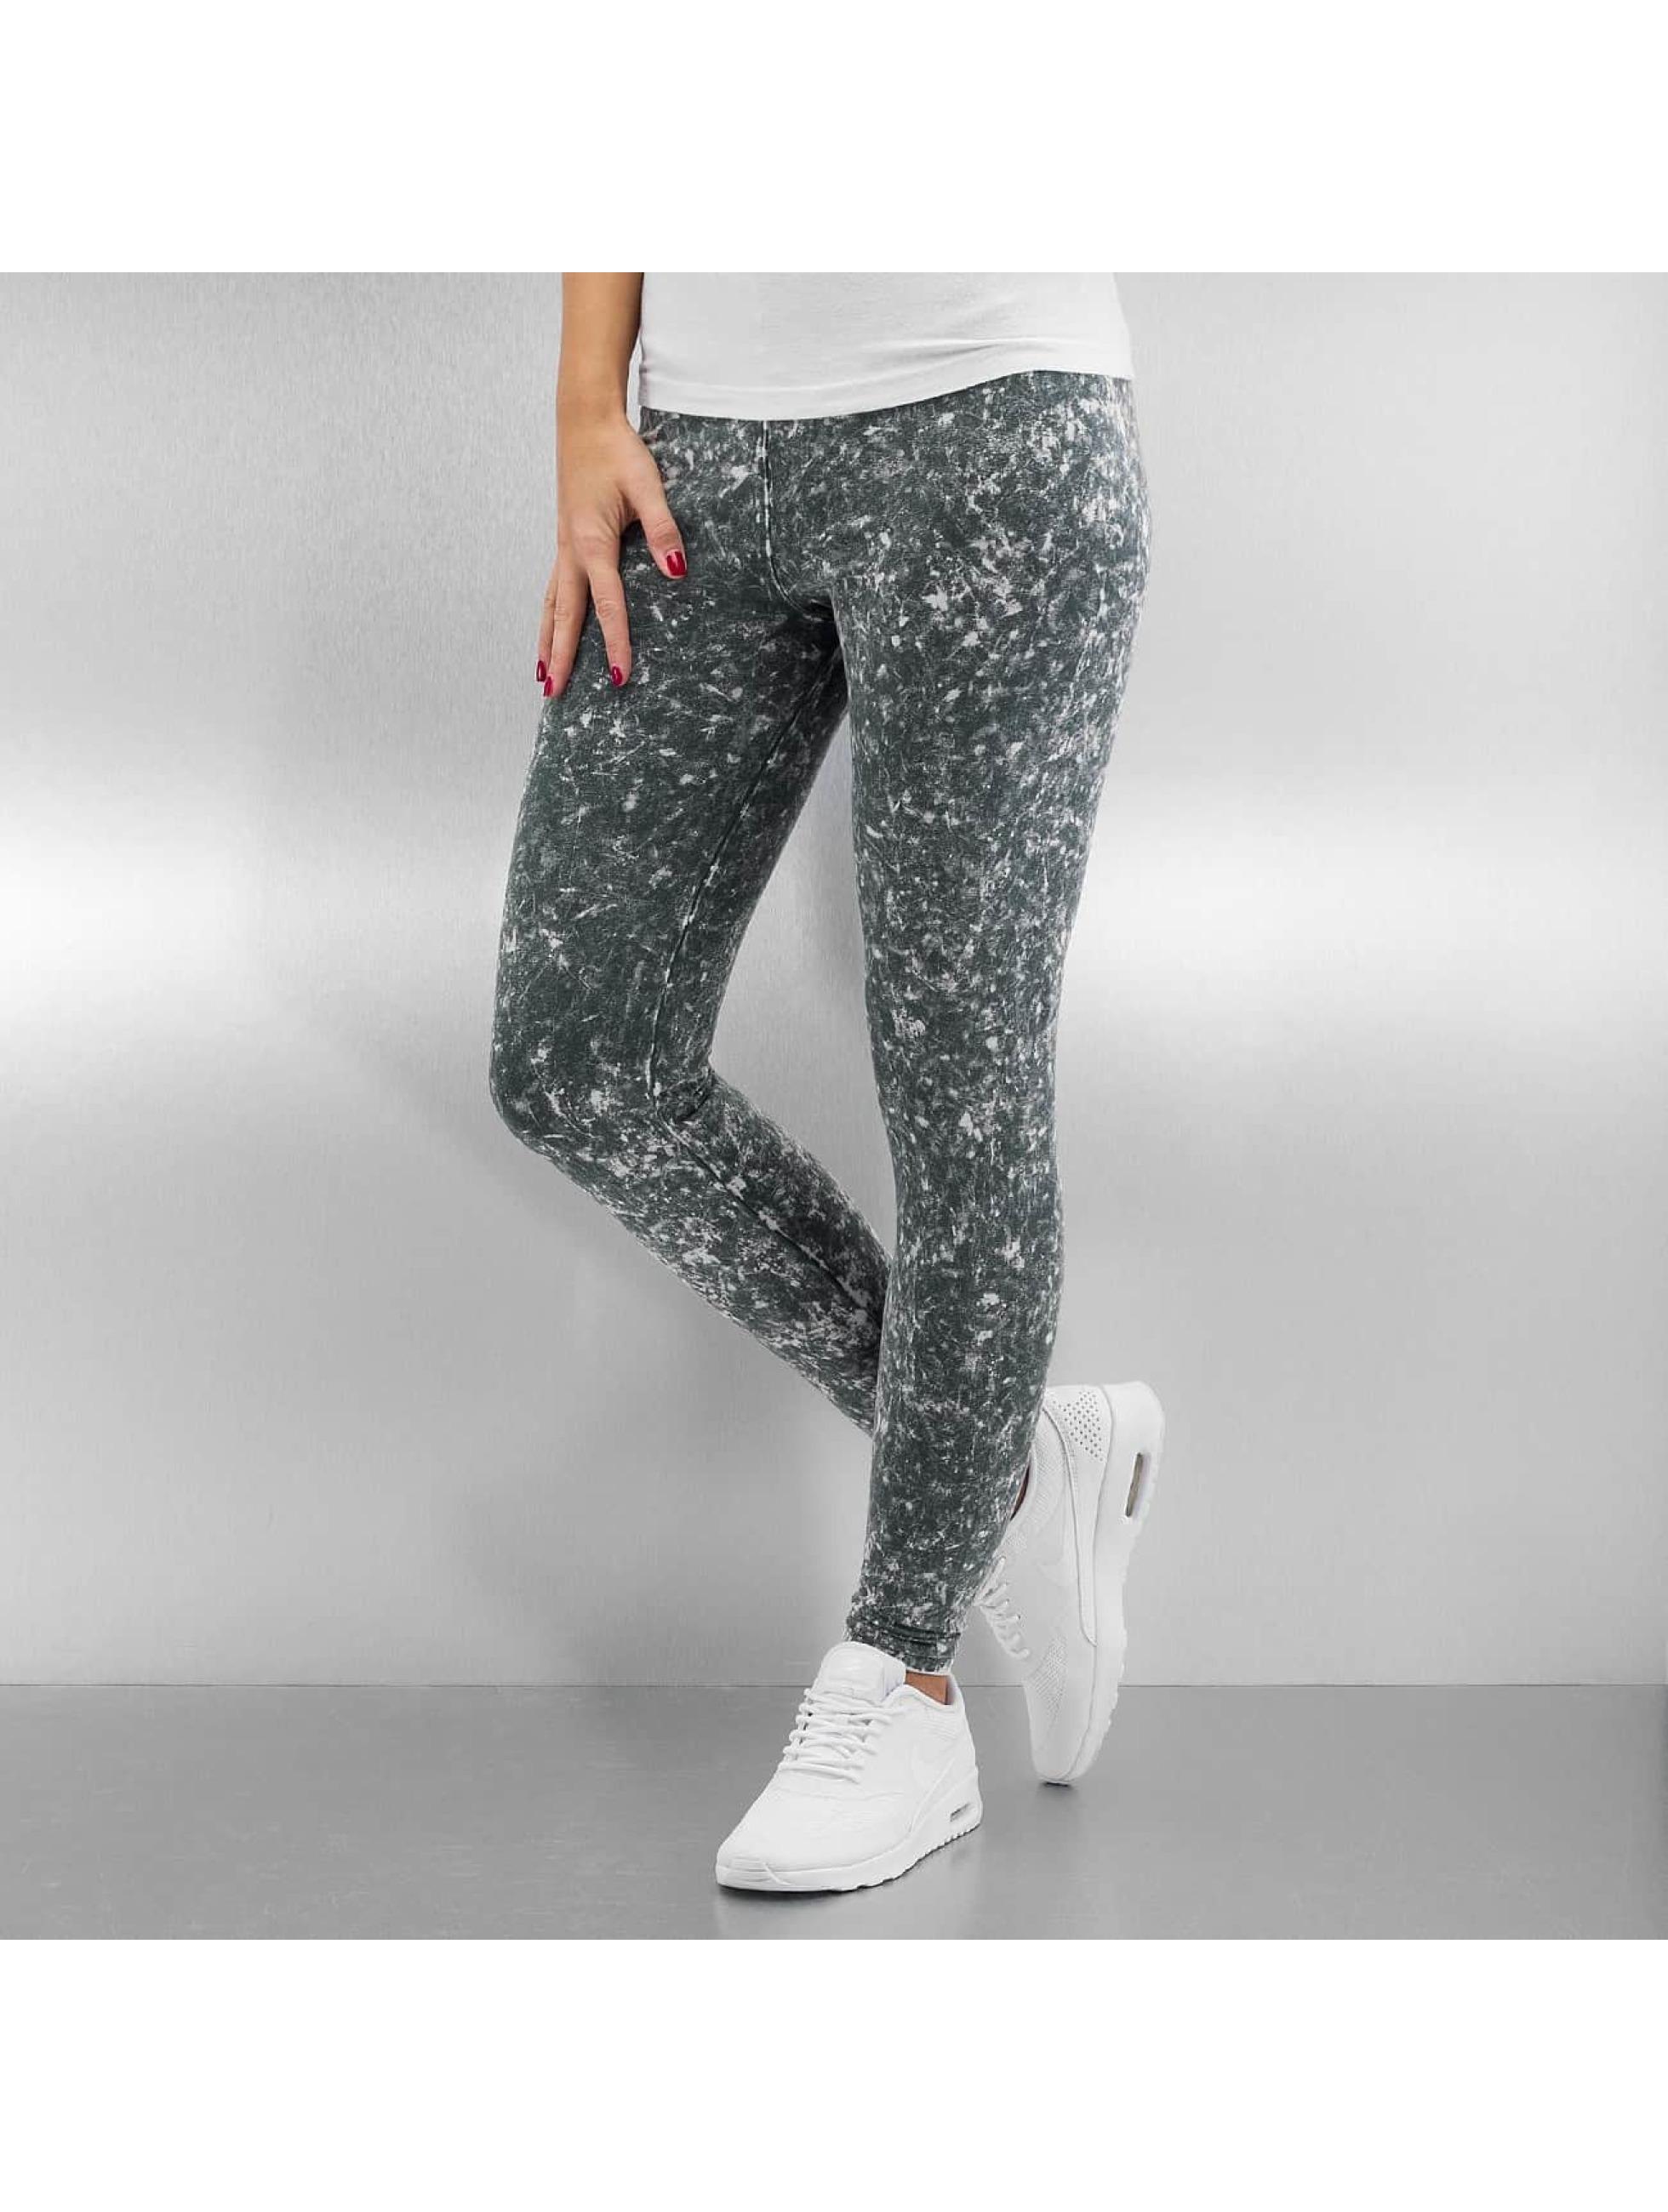 Bangastic-Donne-Pantaloni-Leggings-Acid